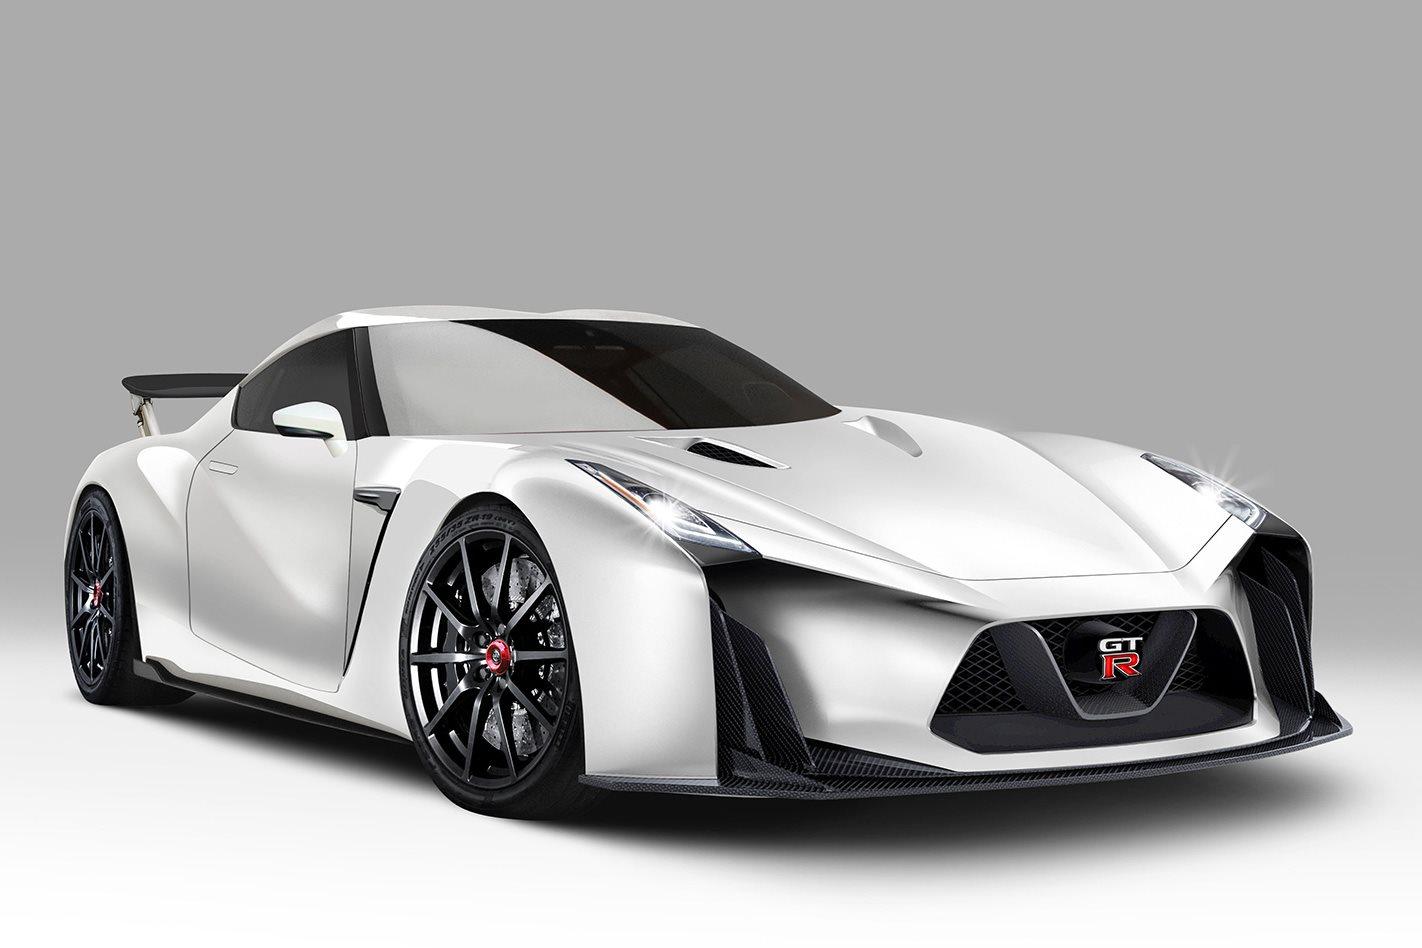 Next generation |Nissan GT-R R36 | concept car | MOTOR